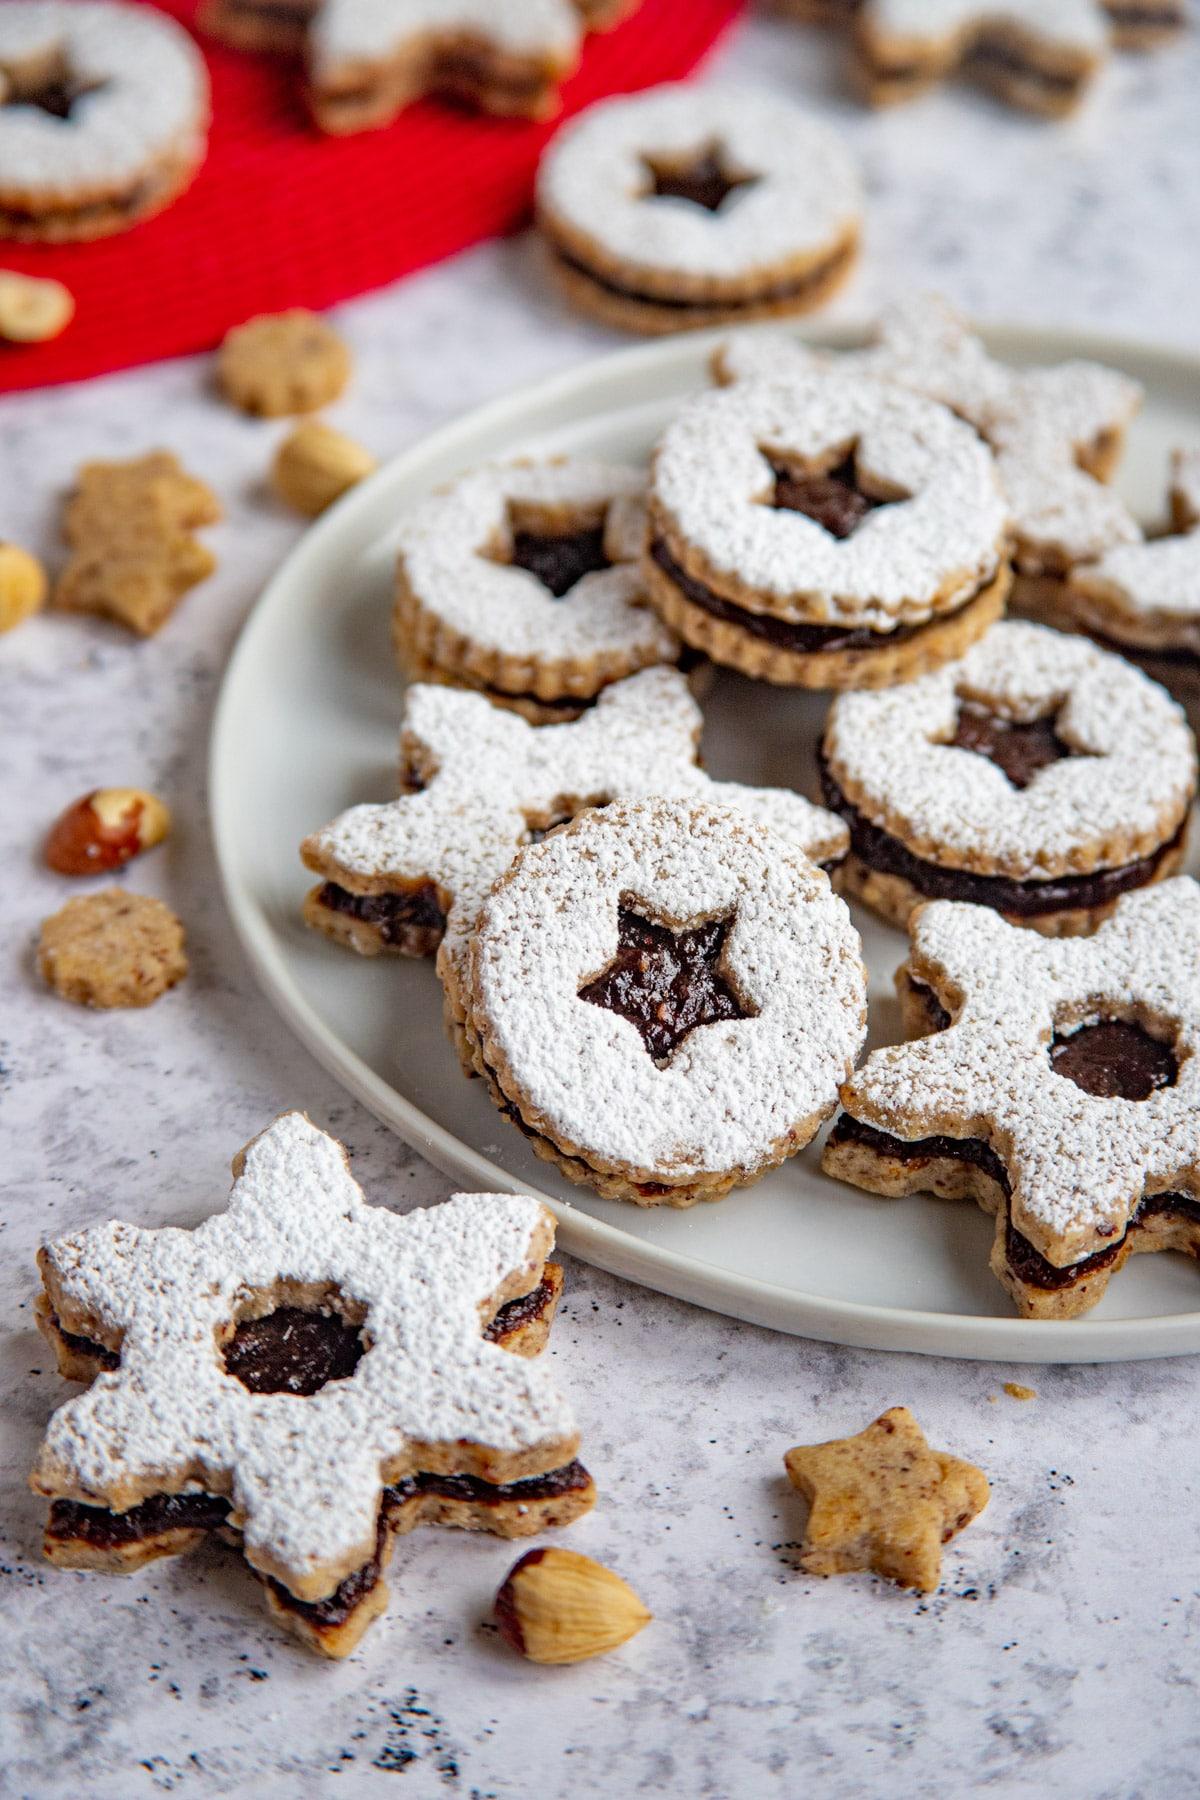 Hazelnut Linzer Prune Jam Cookies on a white plate